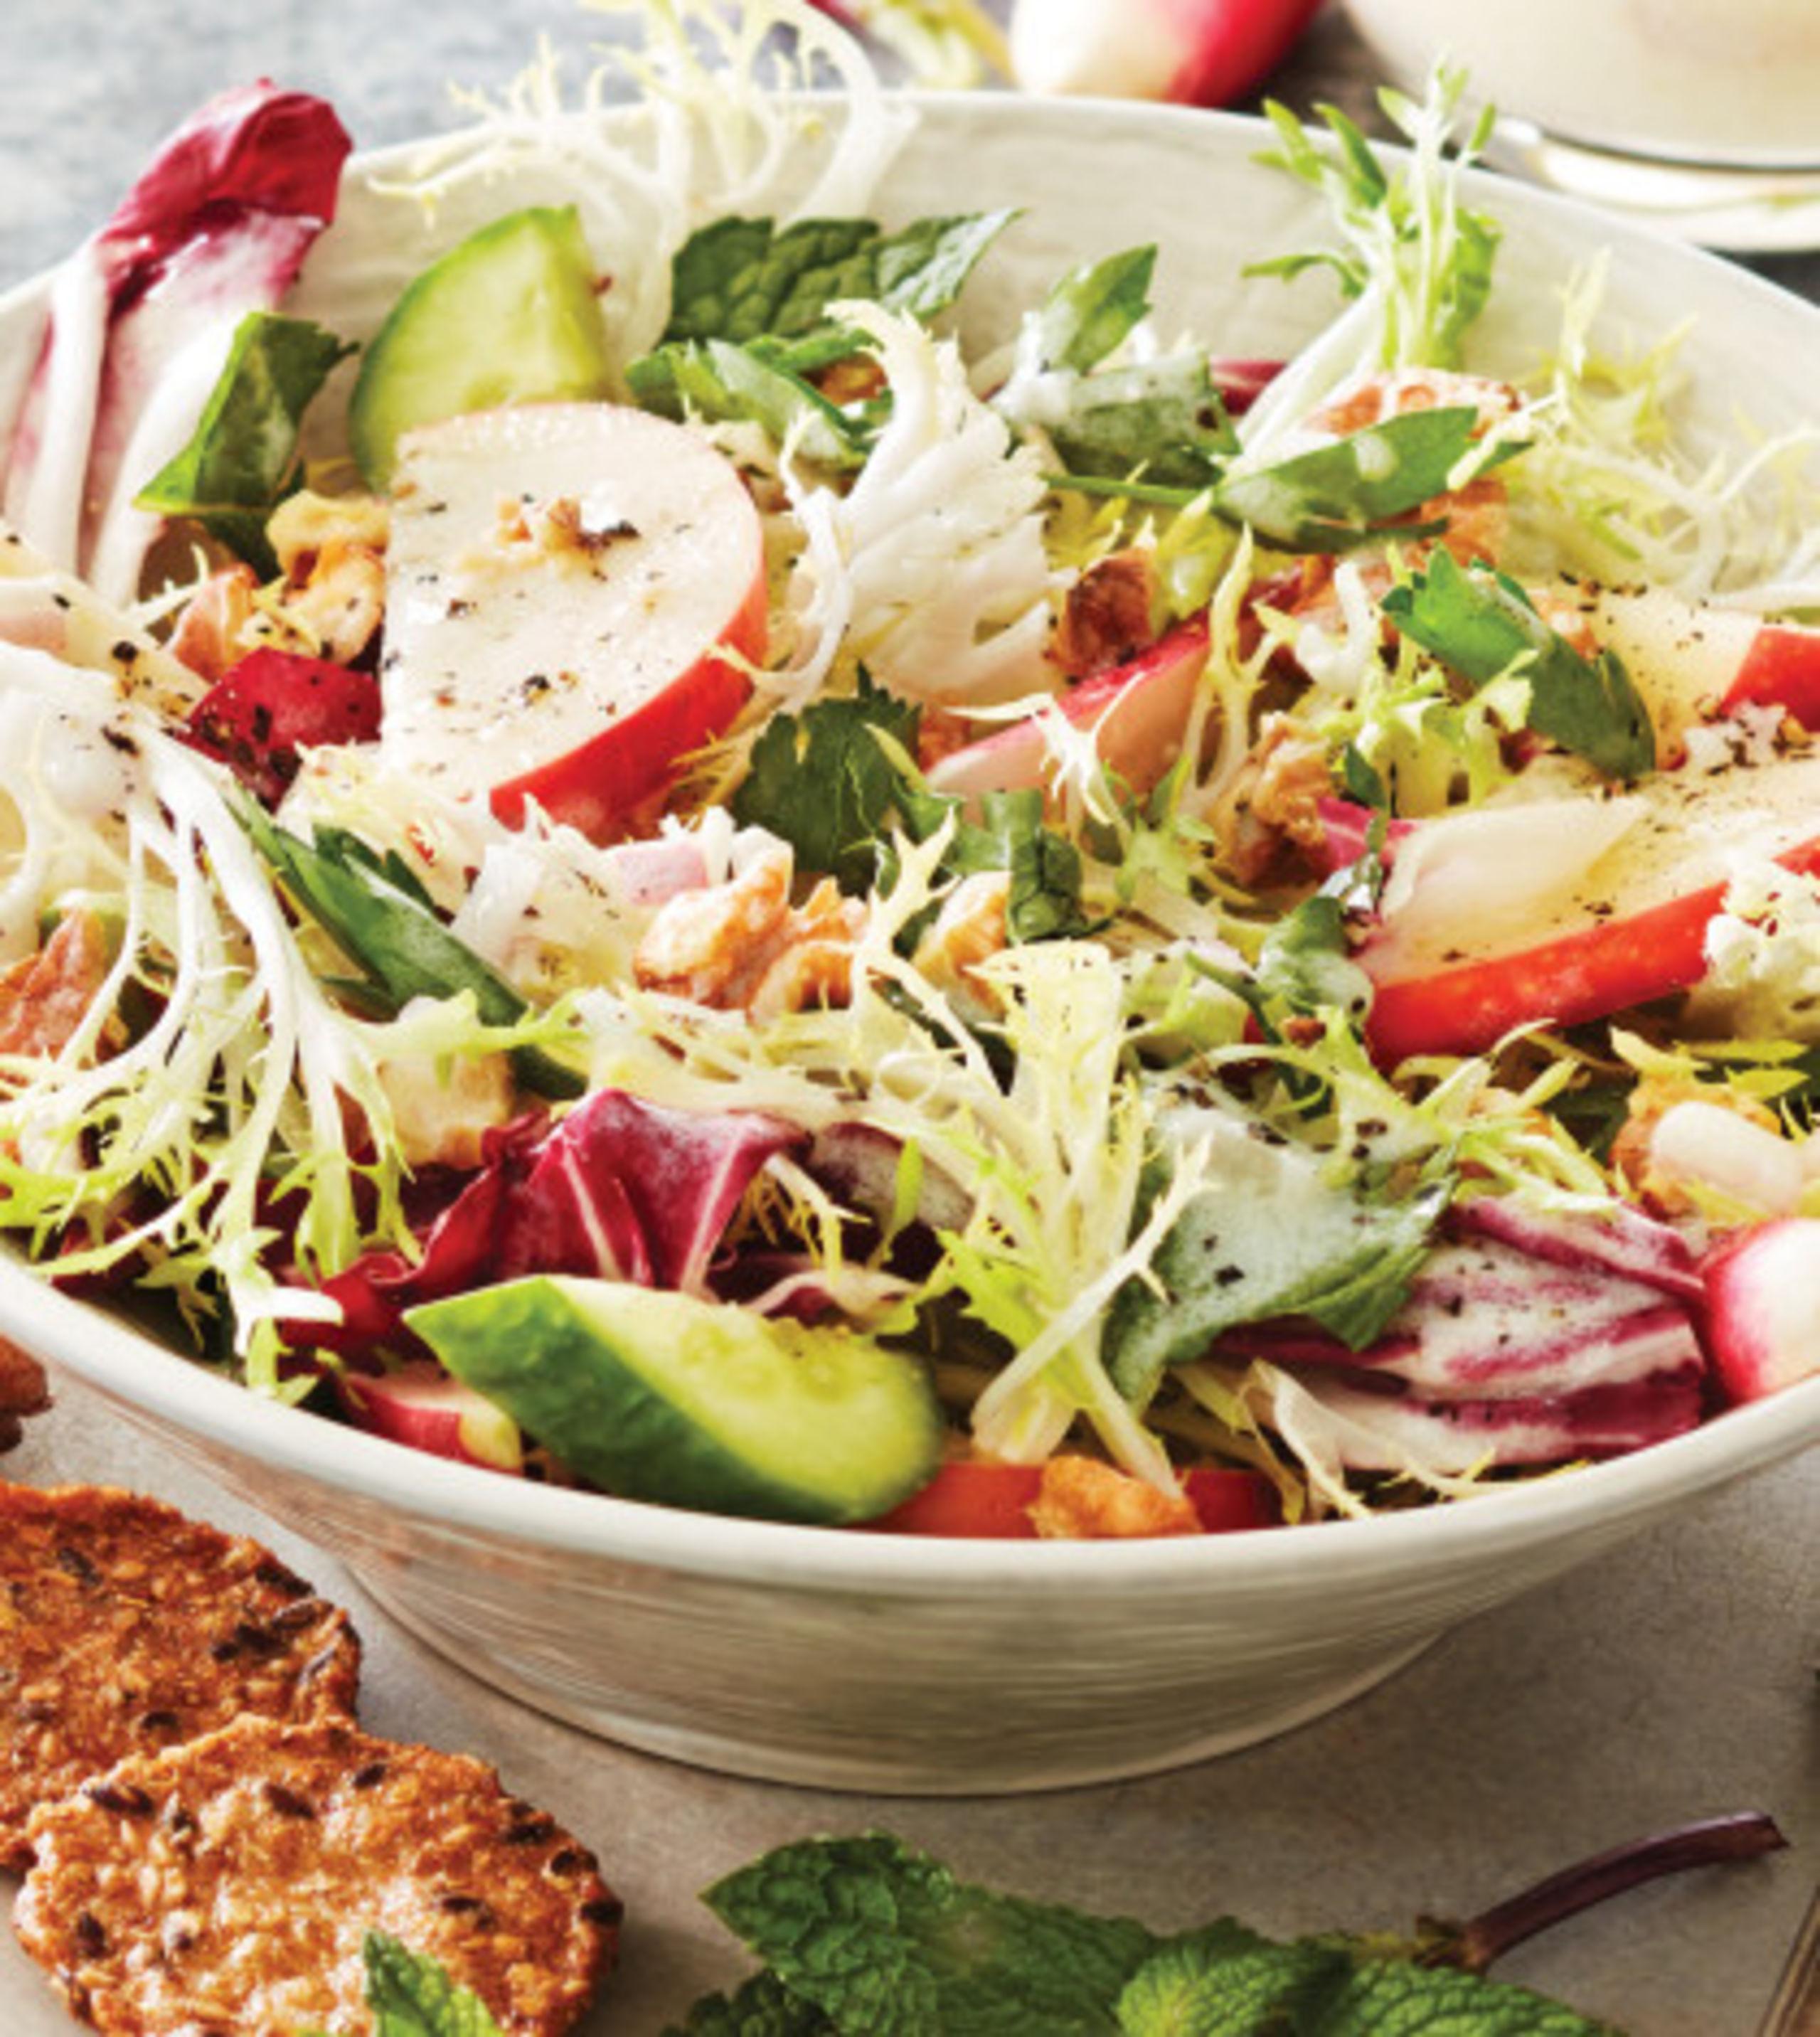 apple-frise--radicchio-salad-with-lemon-kefir-dressing-image